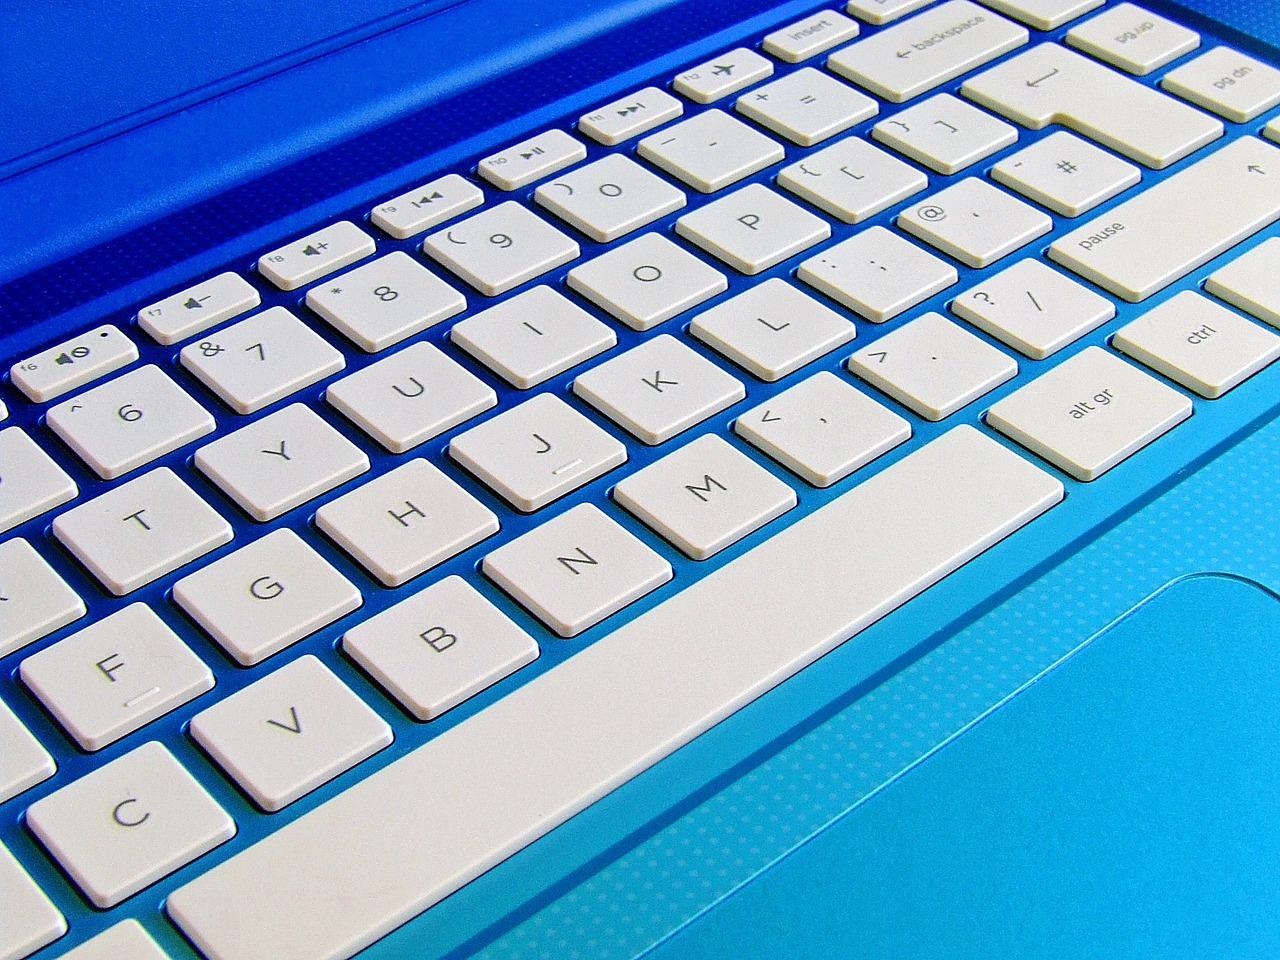 Permalink to раскладка андроид клавиатуры